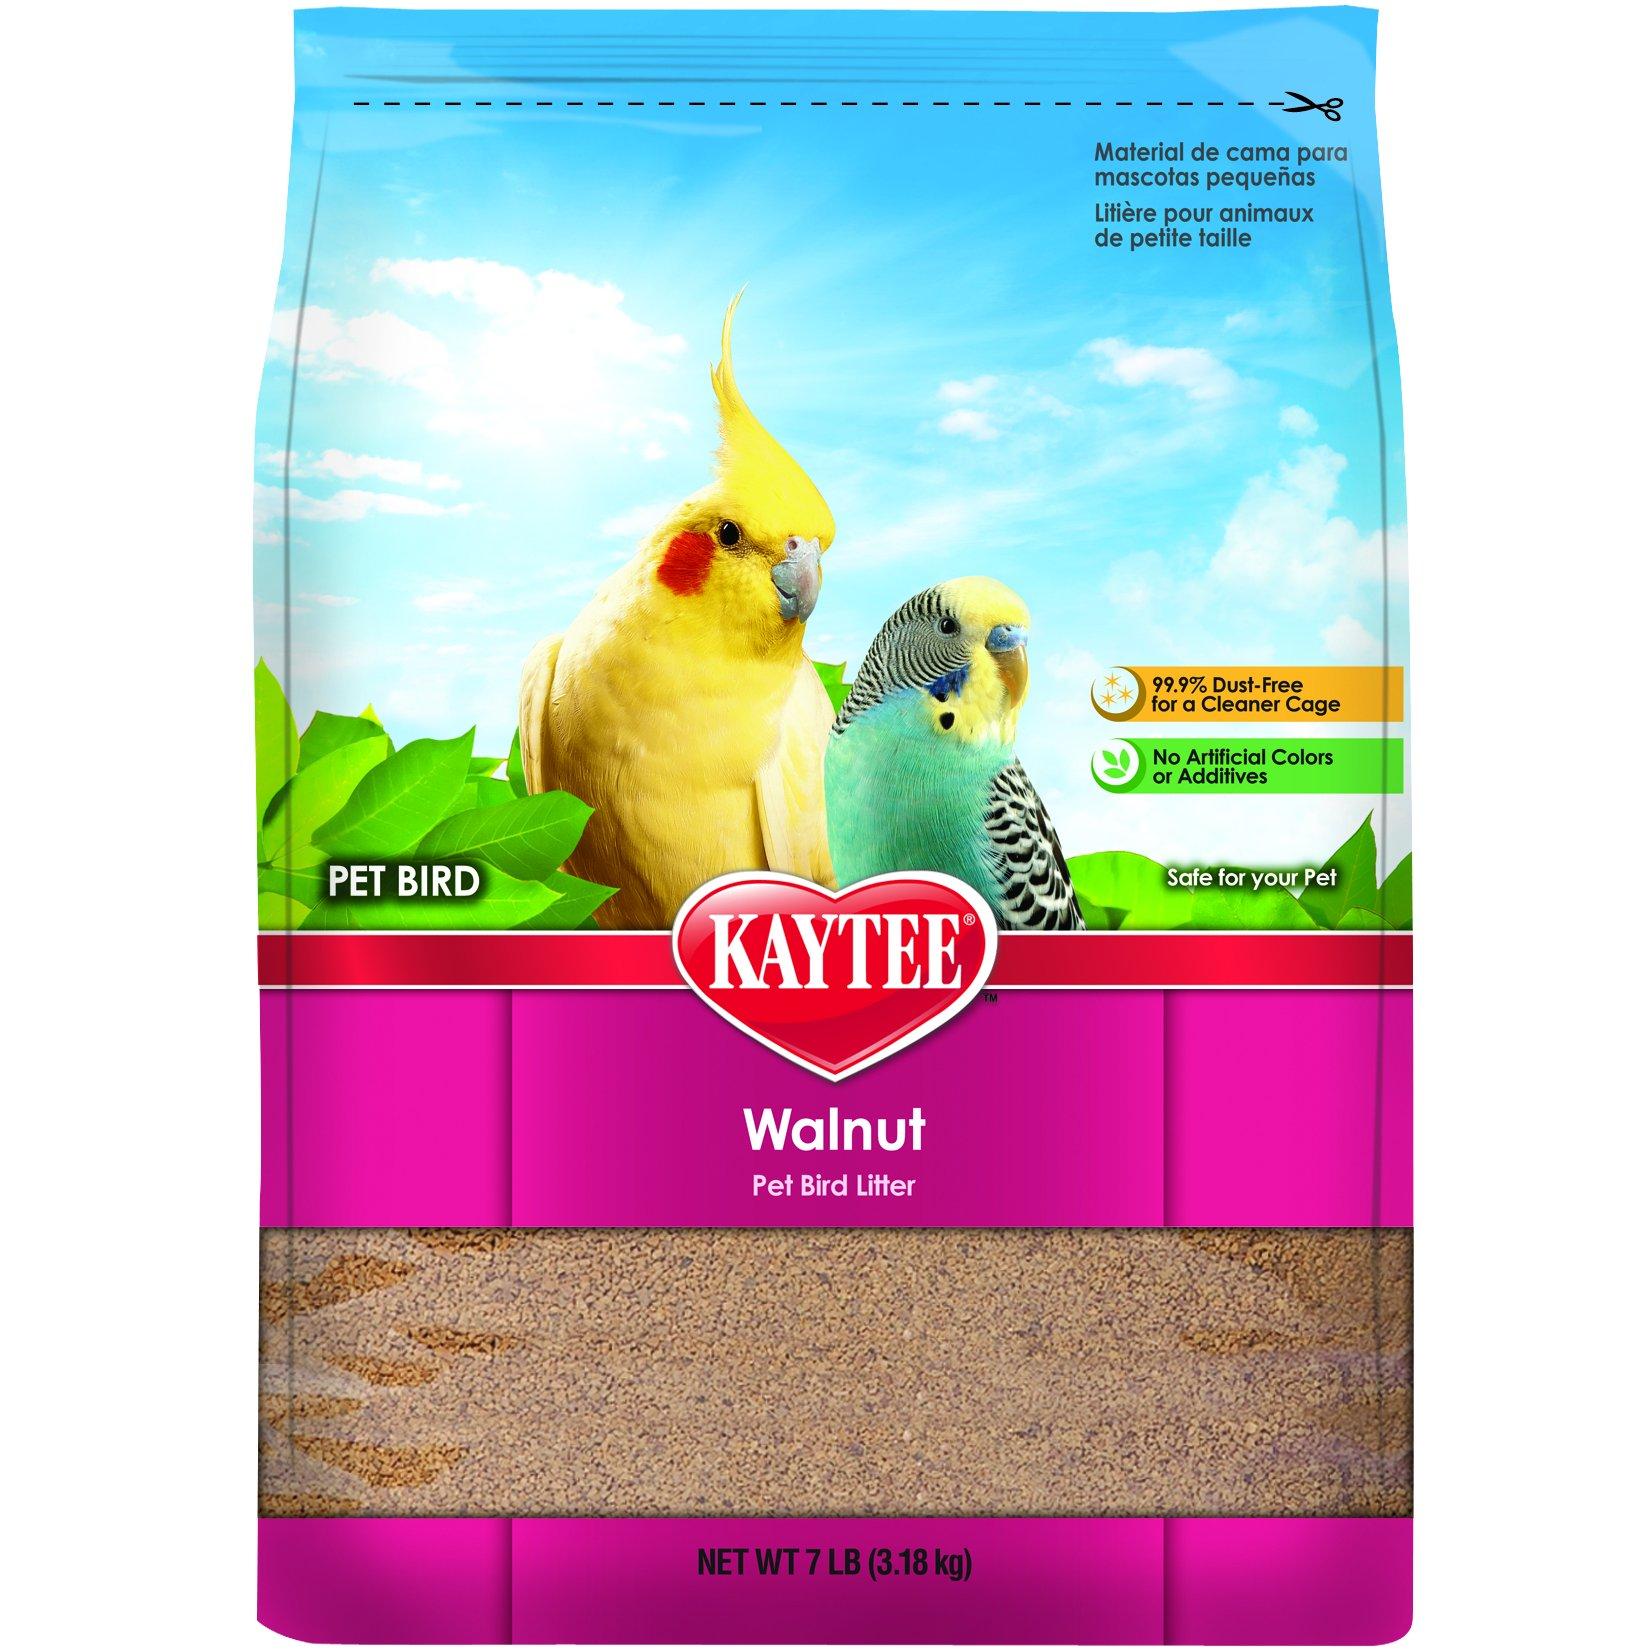 Kaytee Walnut Bedding for Pet Birds